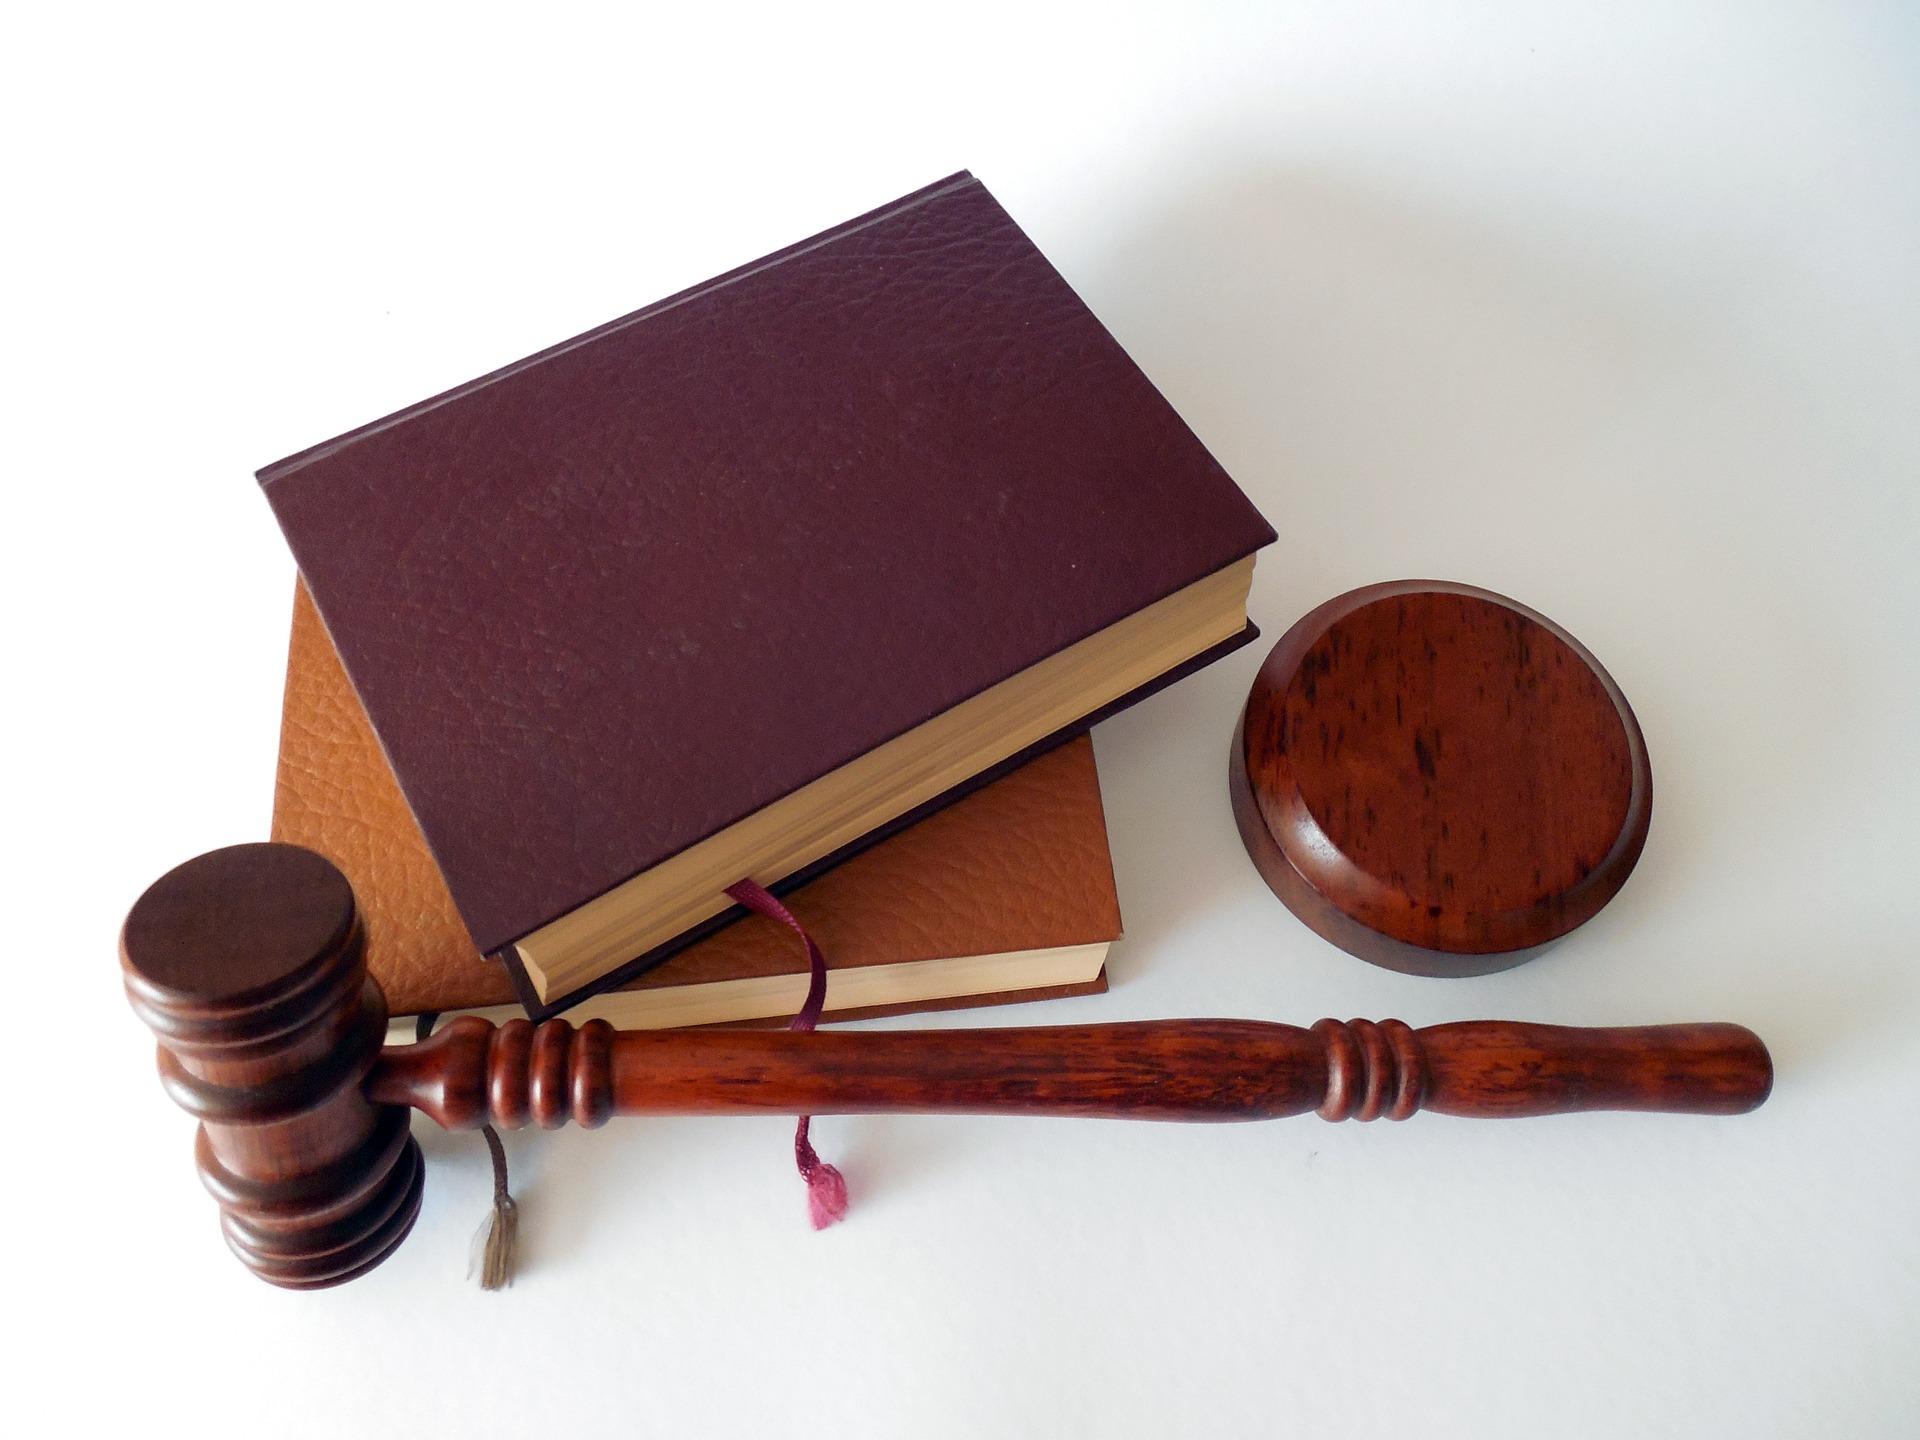 Advokat Lov Hammer Bog Advokatsekretær Bøger Dommer Dom Jura